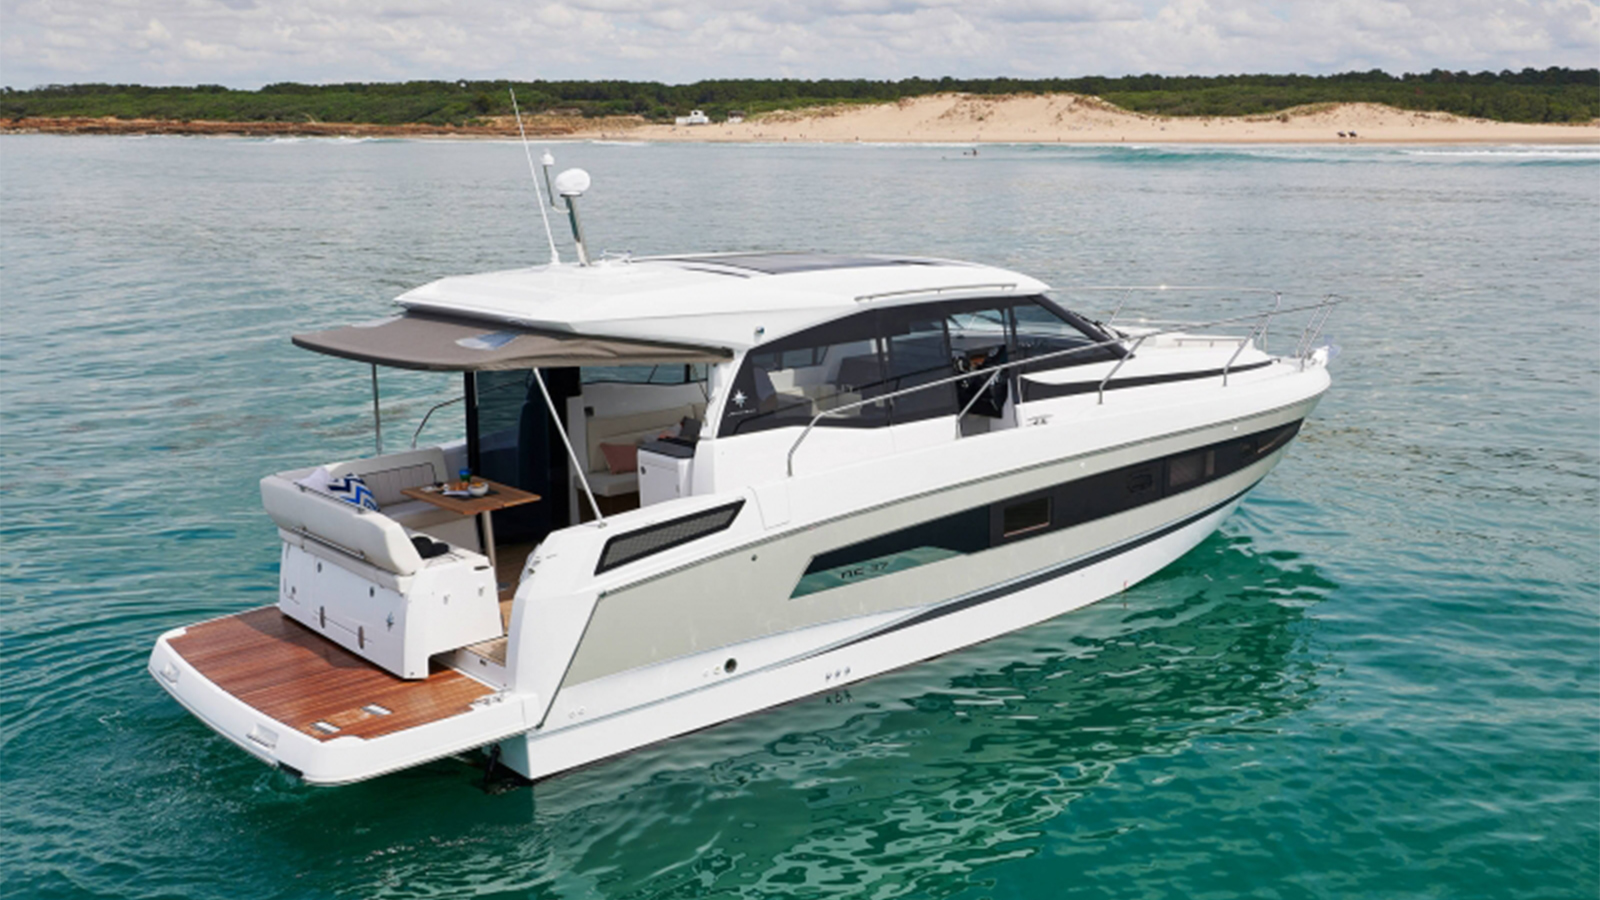 Odyssey Marine|ジャノー(Jeanneau)総代理店 新艇 中古艇 セイル ...